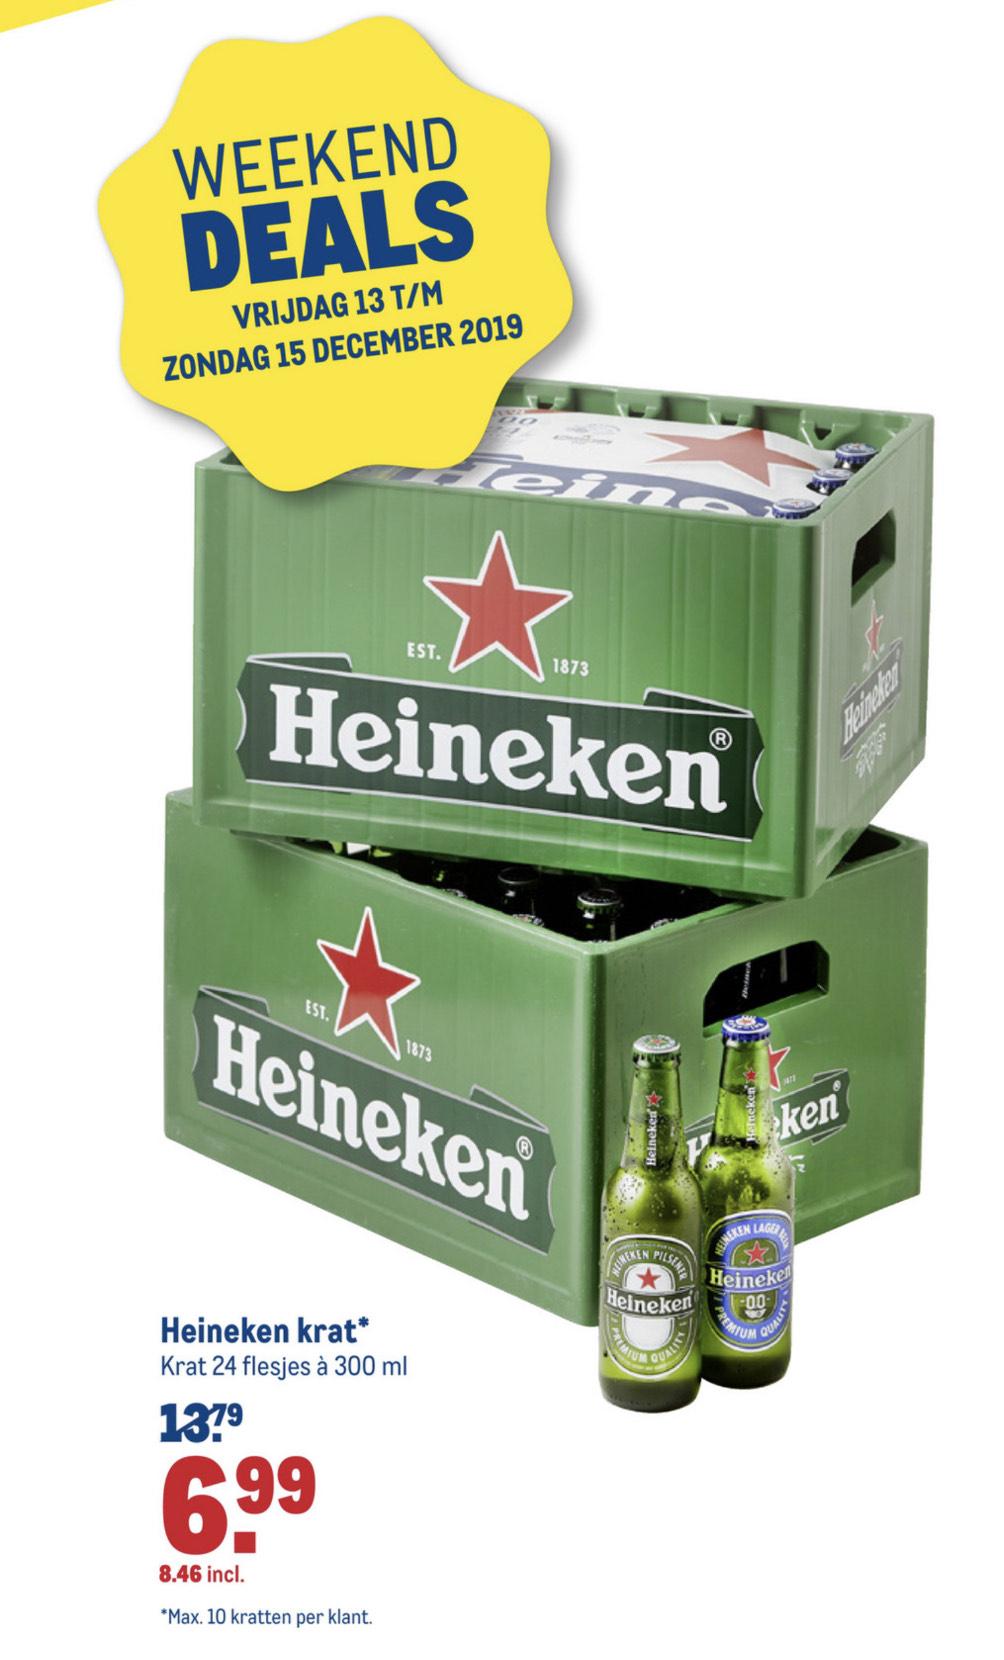 Heineken bier - krat 24 flesjes á 300 ml. - € 8,46 incl. btw!